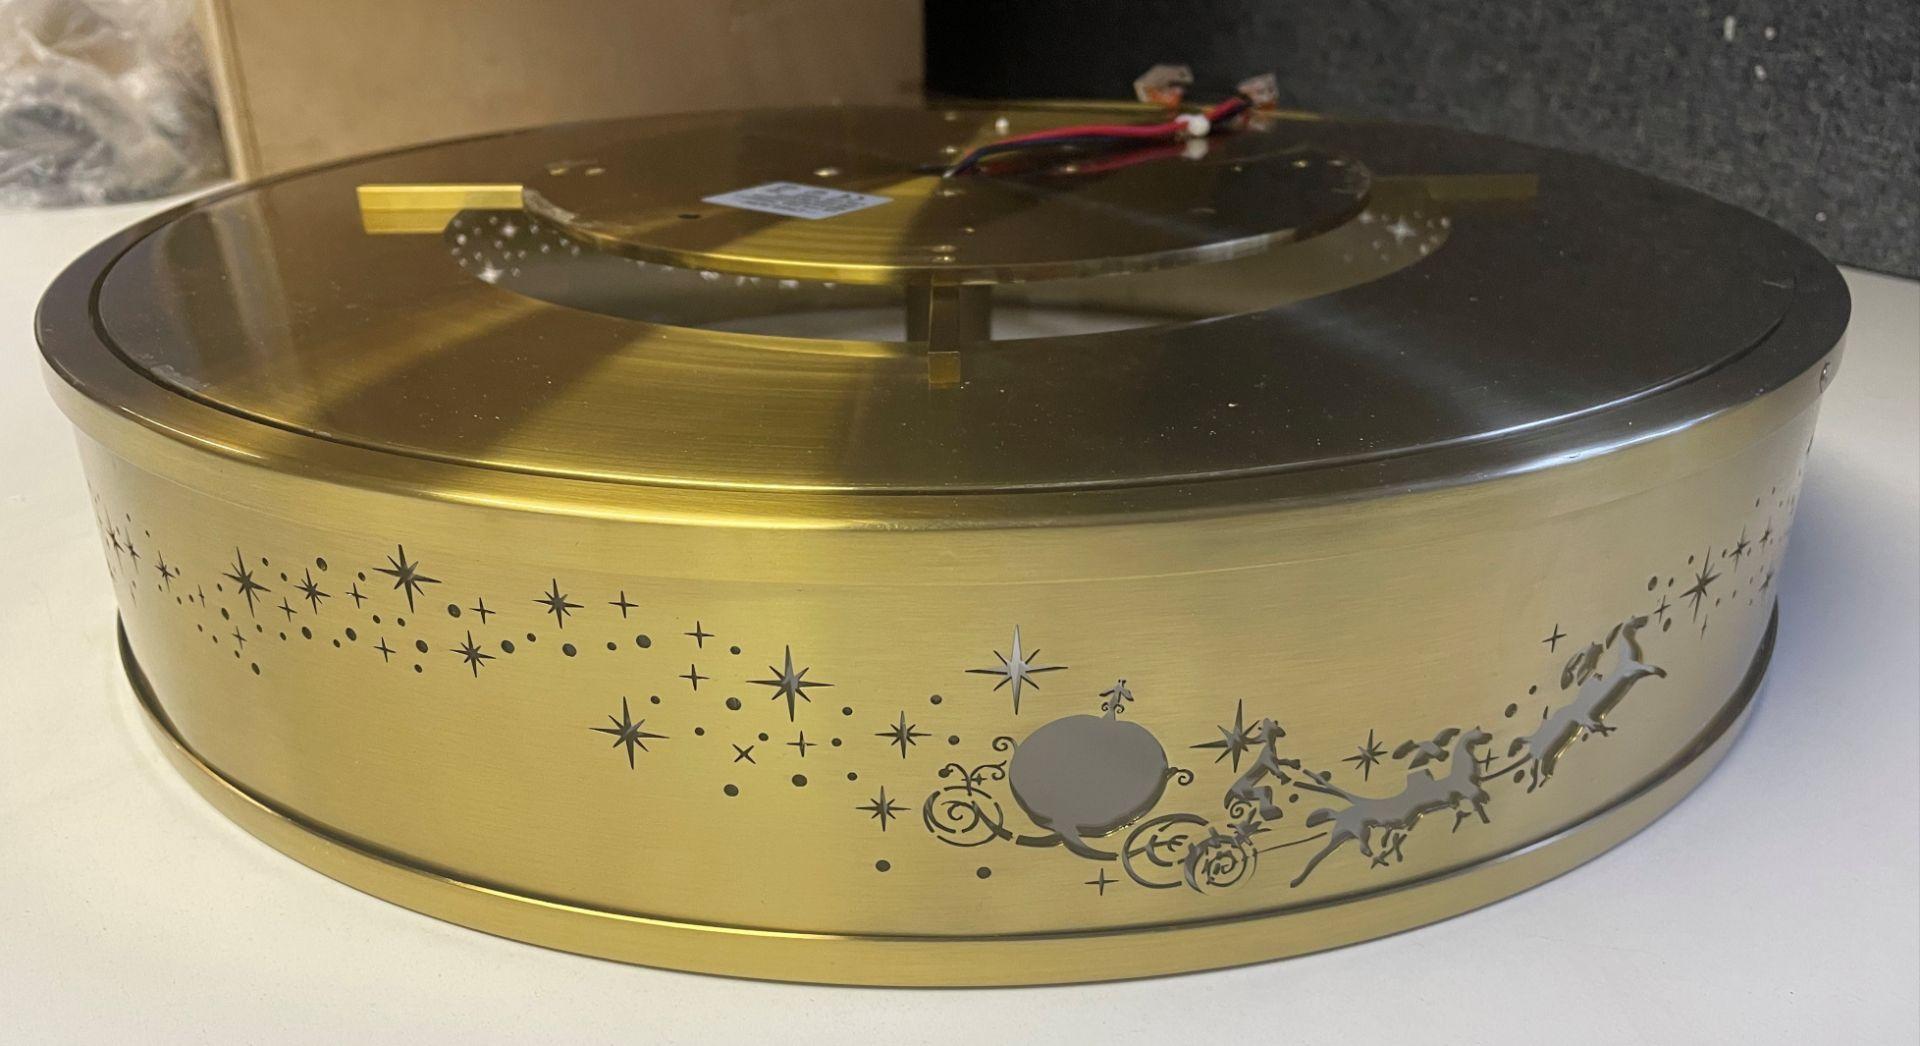 1 x Chelsom 'Disney' New Build Brushed Brass Ceiling Arcade Pendent Light Fitting - Sample we under